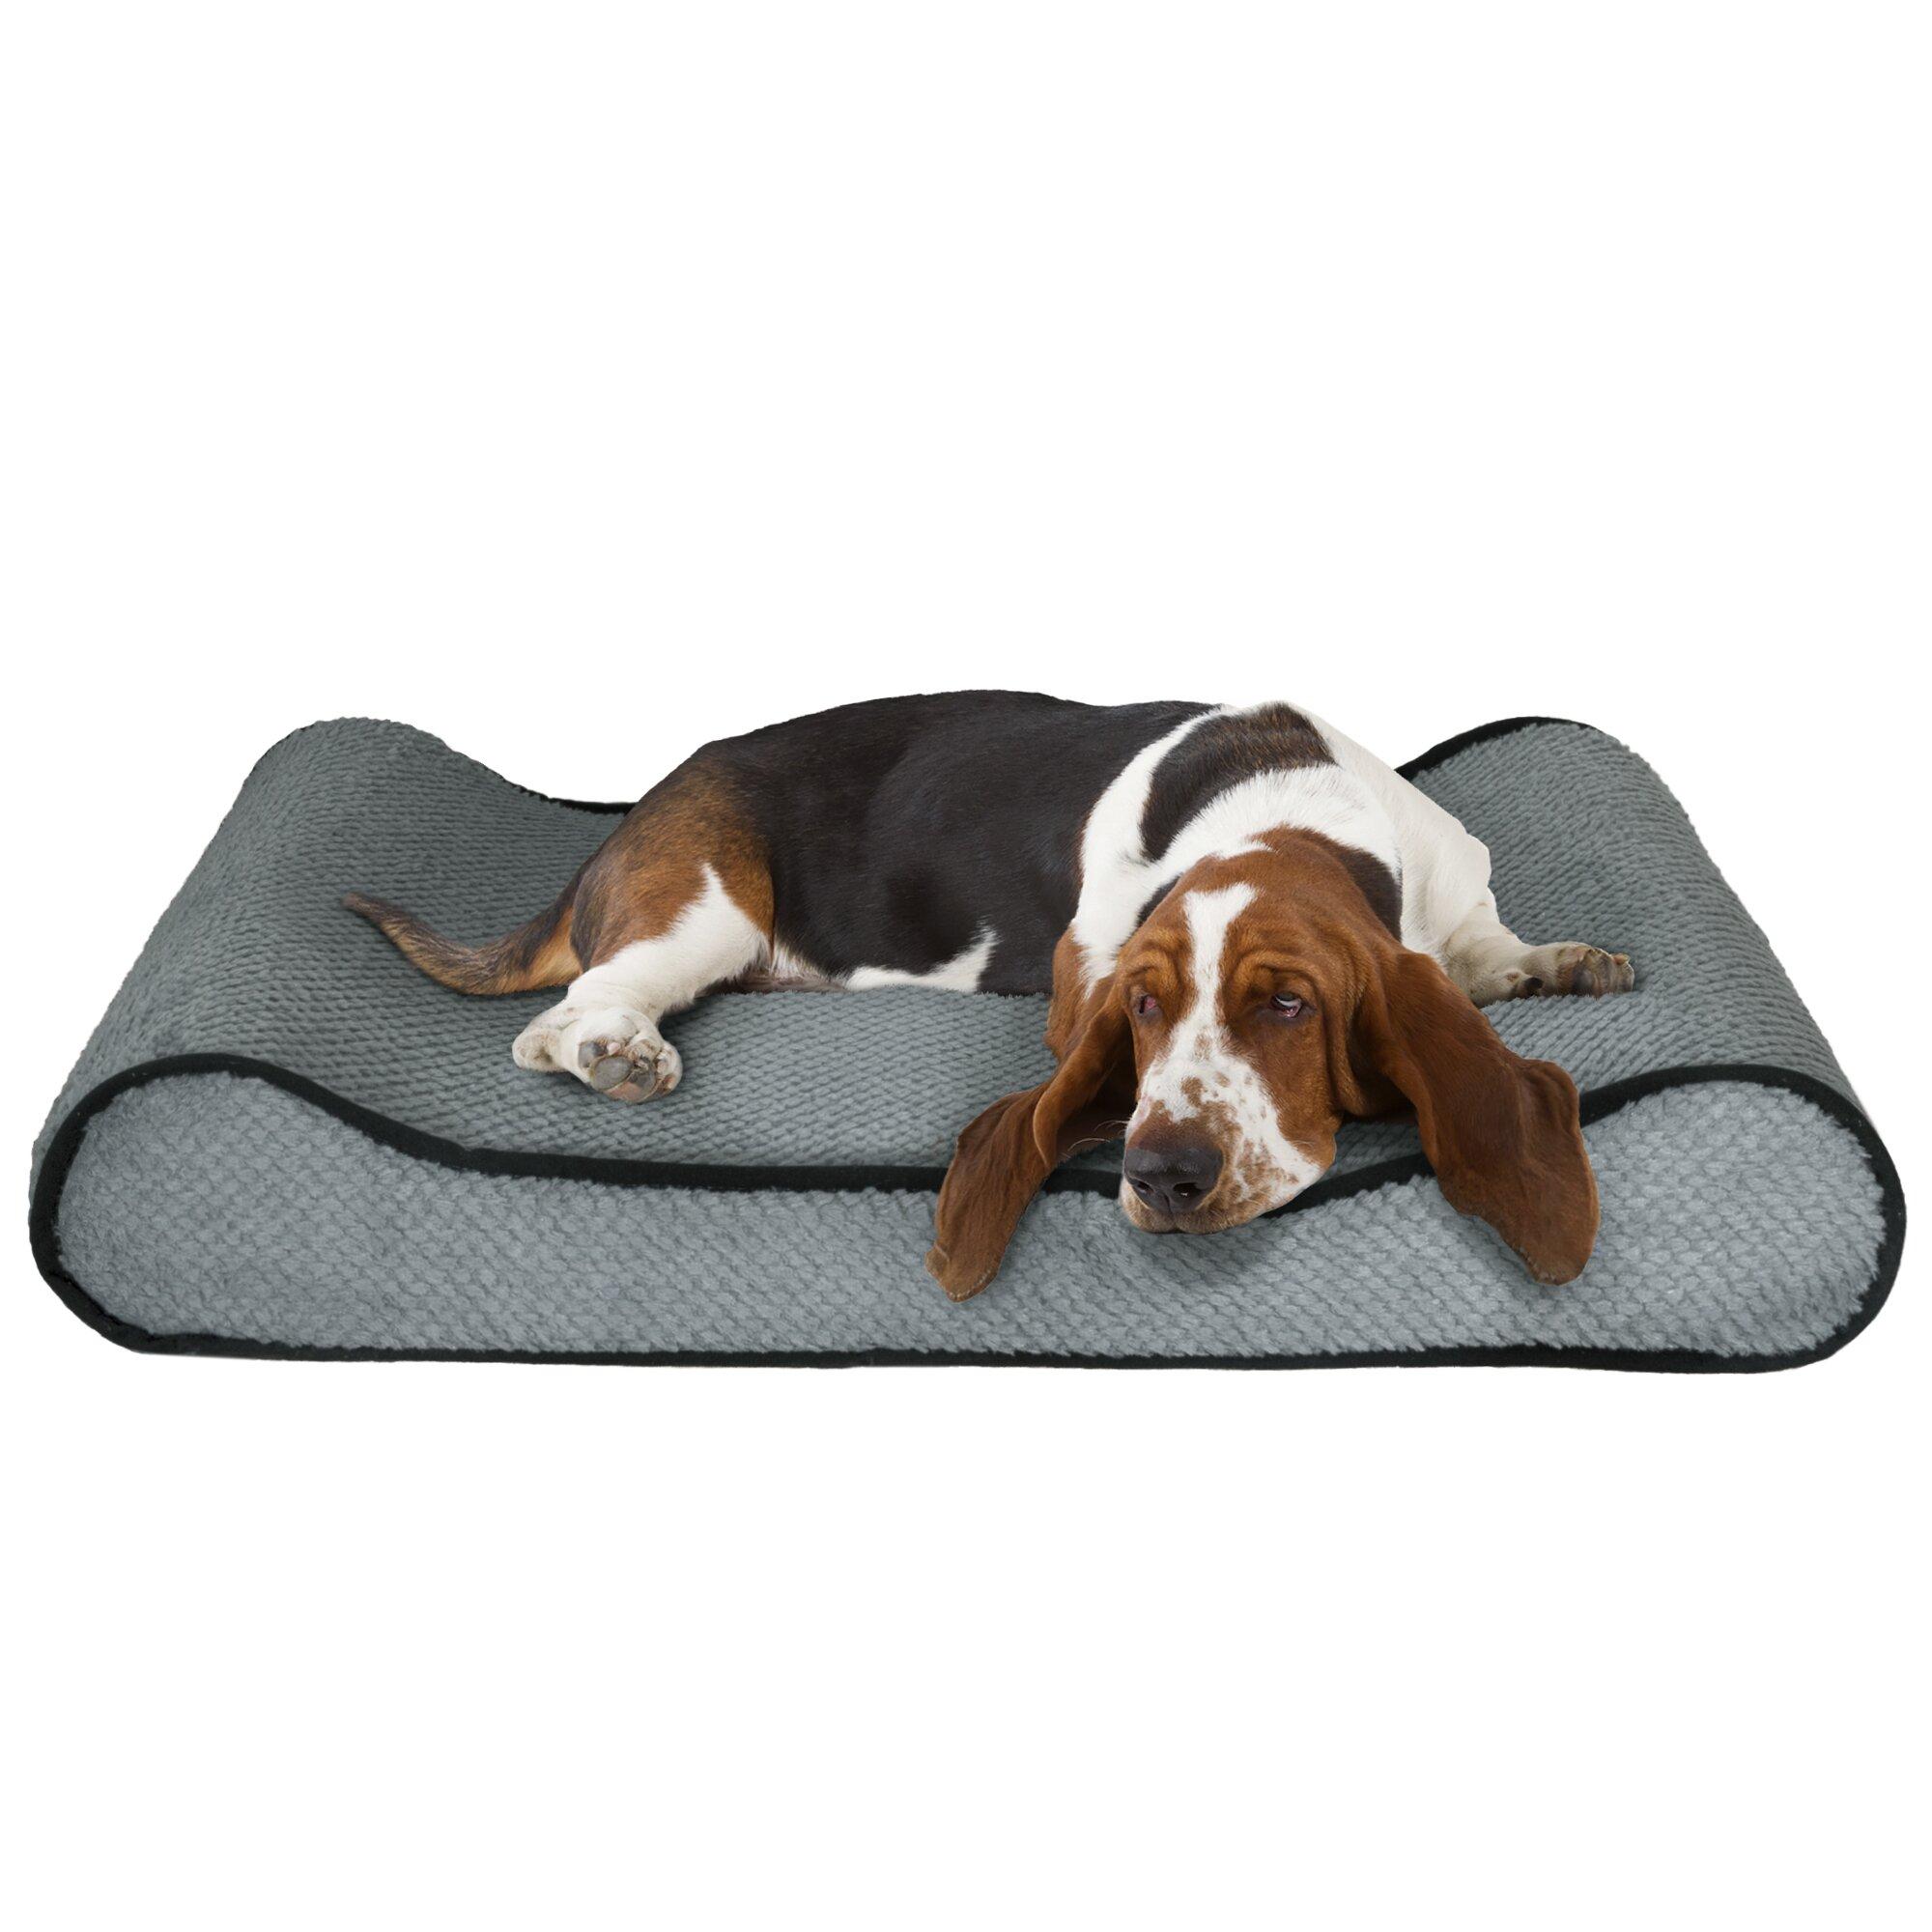 petmaker orthopedic memory foam bolster dog bed with bolsters on both ends reviews. Black Bedroom Furniture Sets. Home Design Ideas